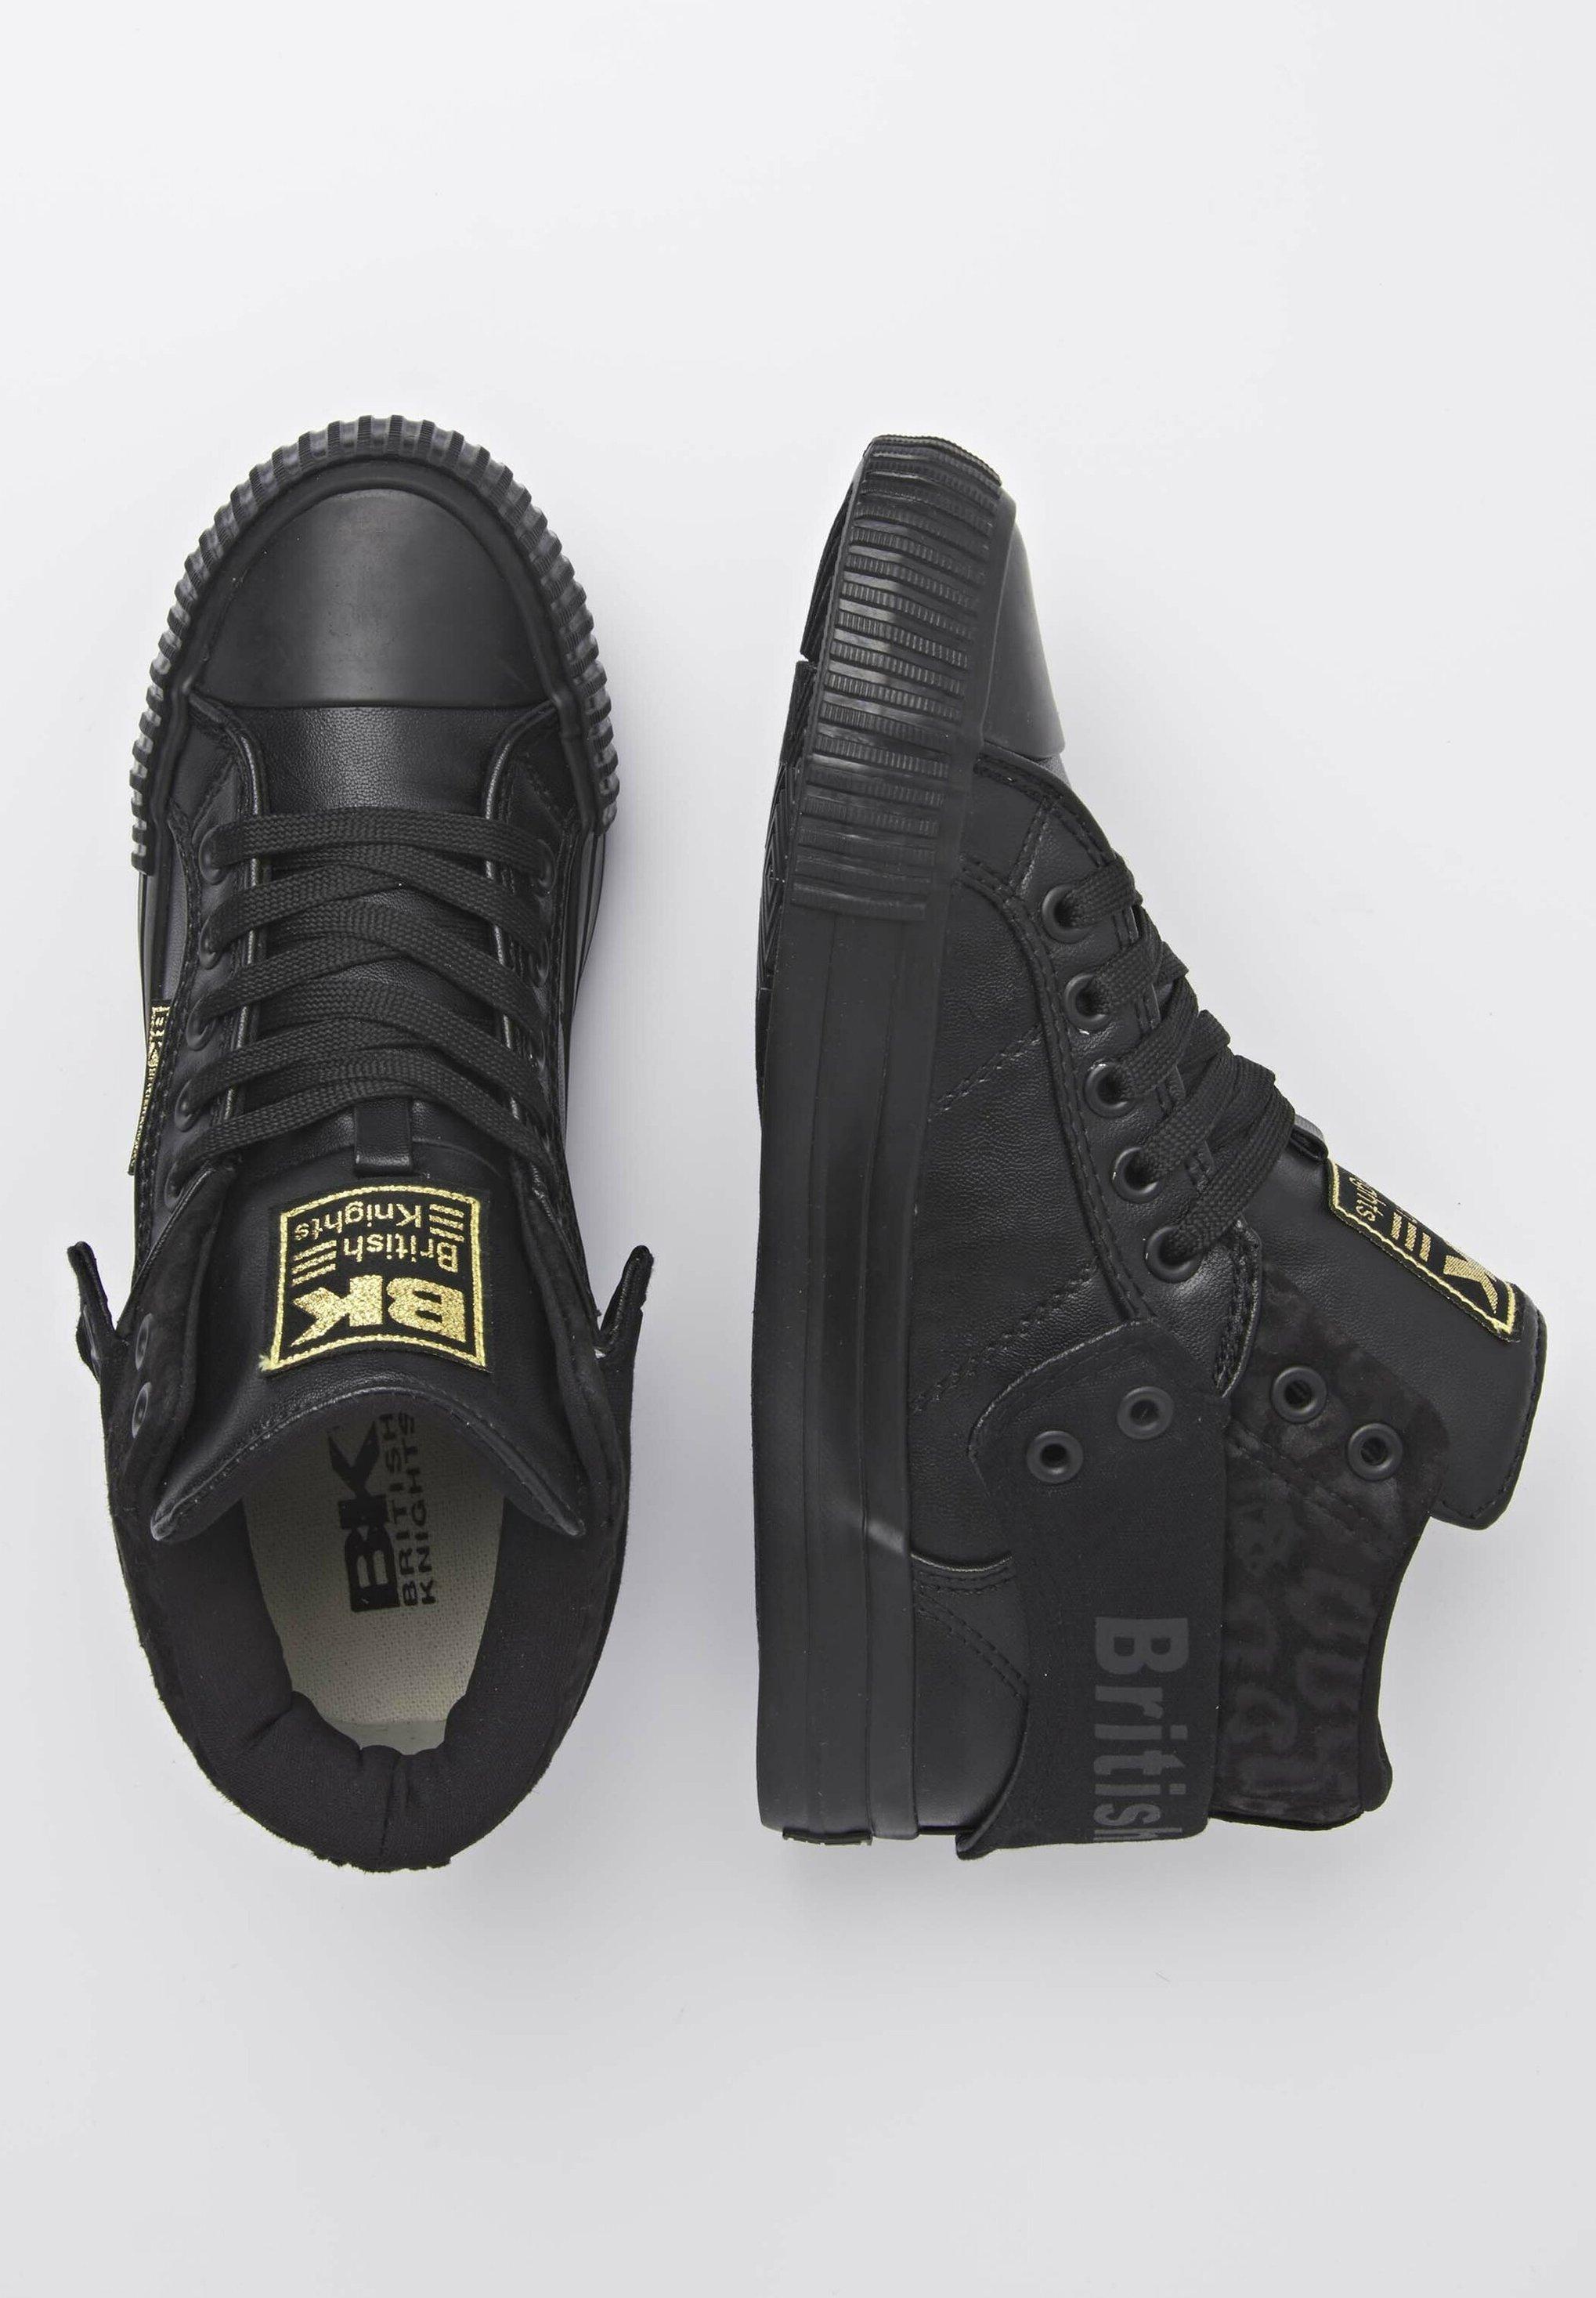 British Knights SNEAKER ROCO Sneaker high black/black leopard/black/black denim